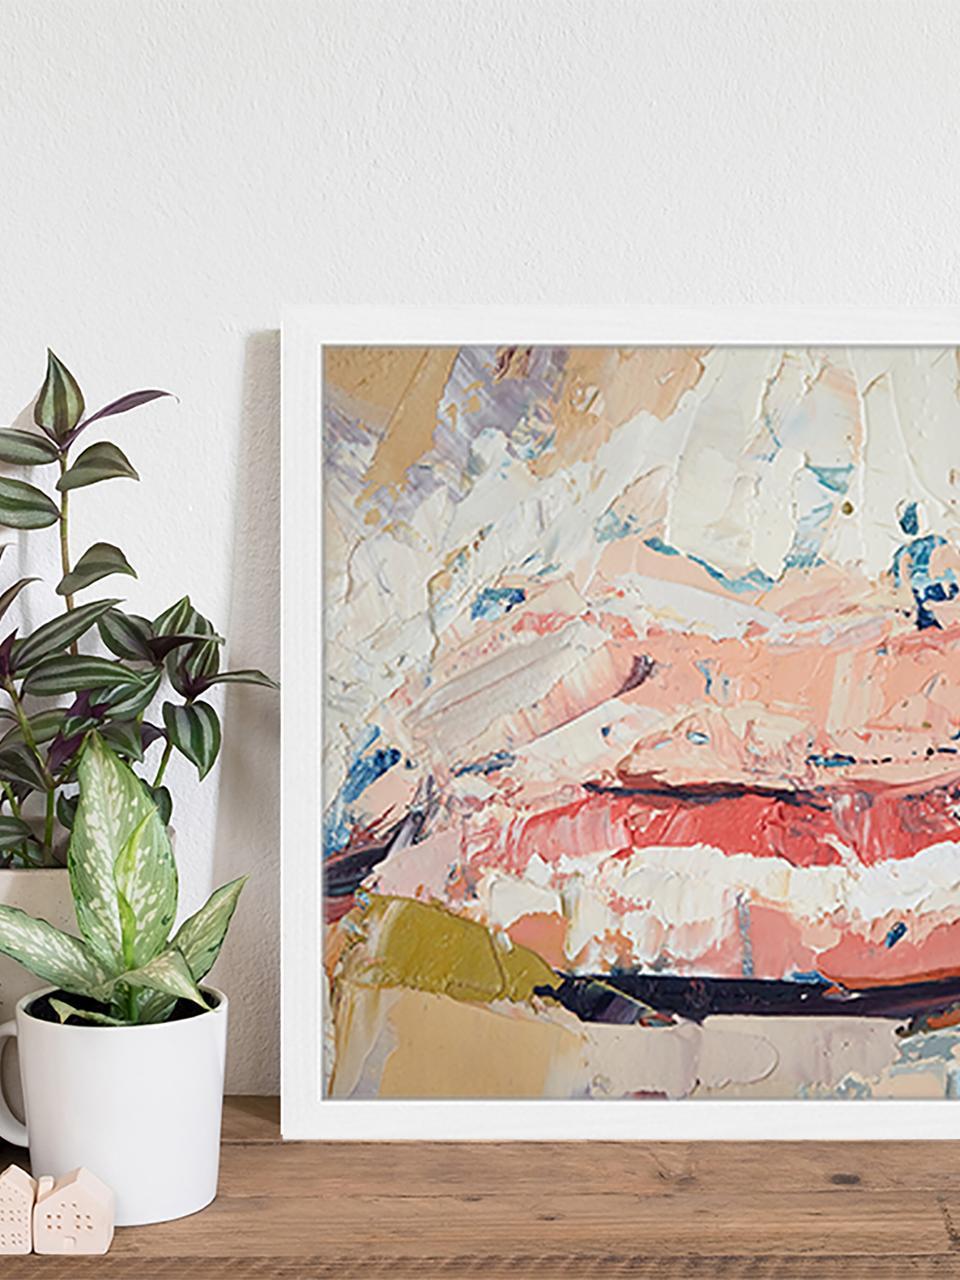 Gerahmter Digitaldruck Kiss Me, Bild: Digitaldruck auf Papier, , Rahmen: Holz, lackiert, Front: Plexiglas, Mehrfarbig, 53 x 43 cm